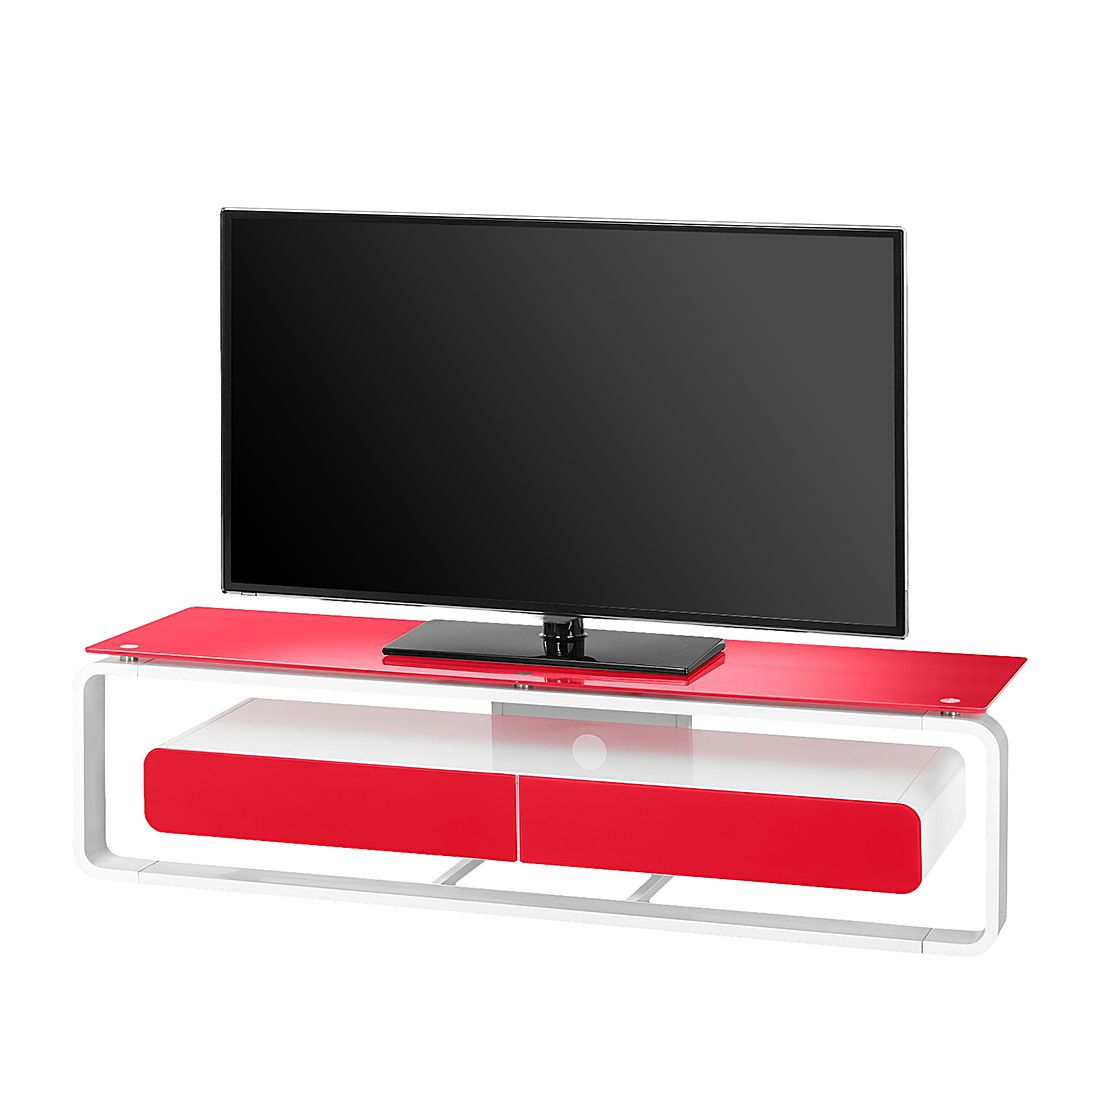 Supporto TV Shanon - Bianco / Vetro rosso - 150 cm, Maja Möbel